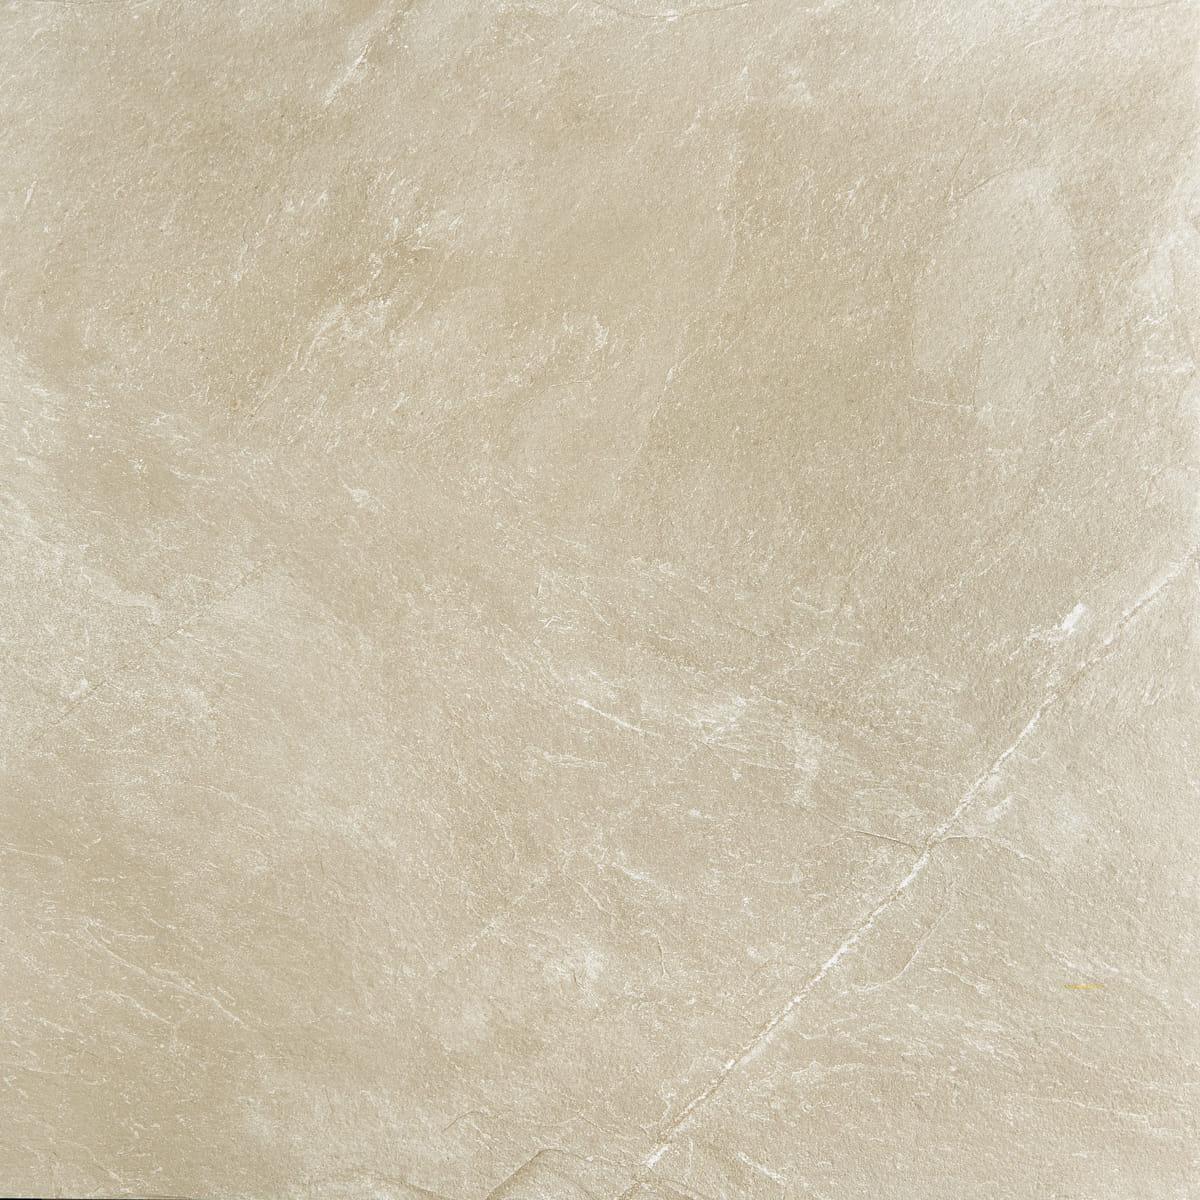 FOTO 2 sandstone ivory ant 75x75 1